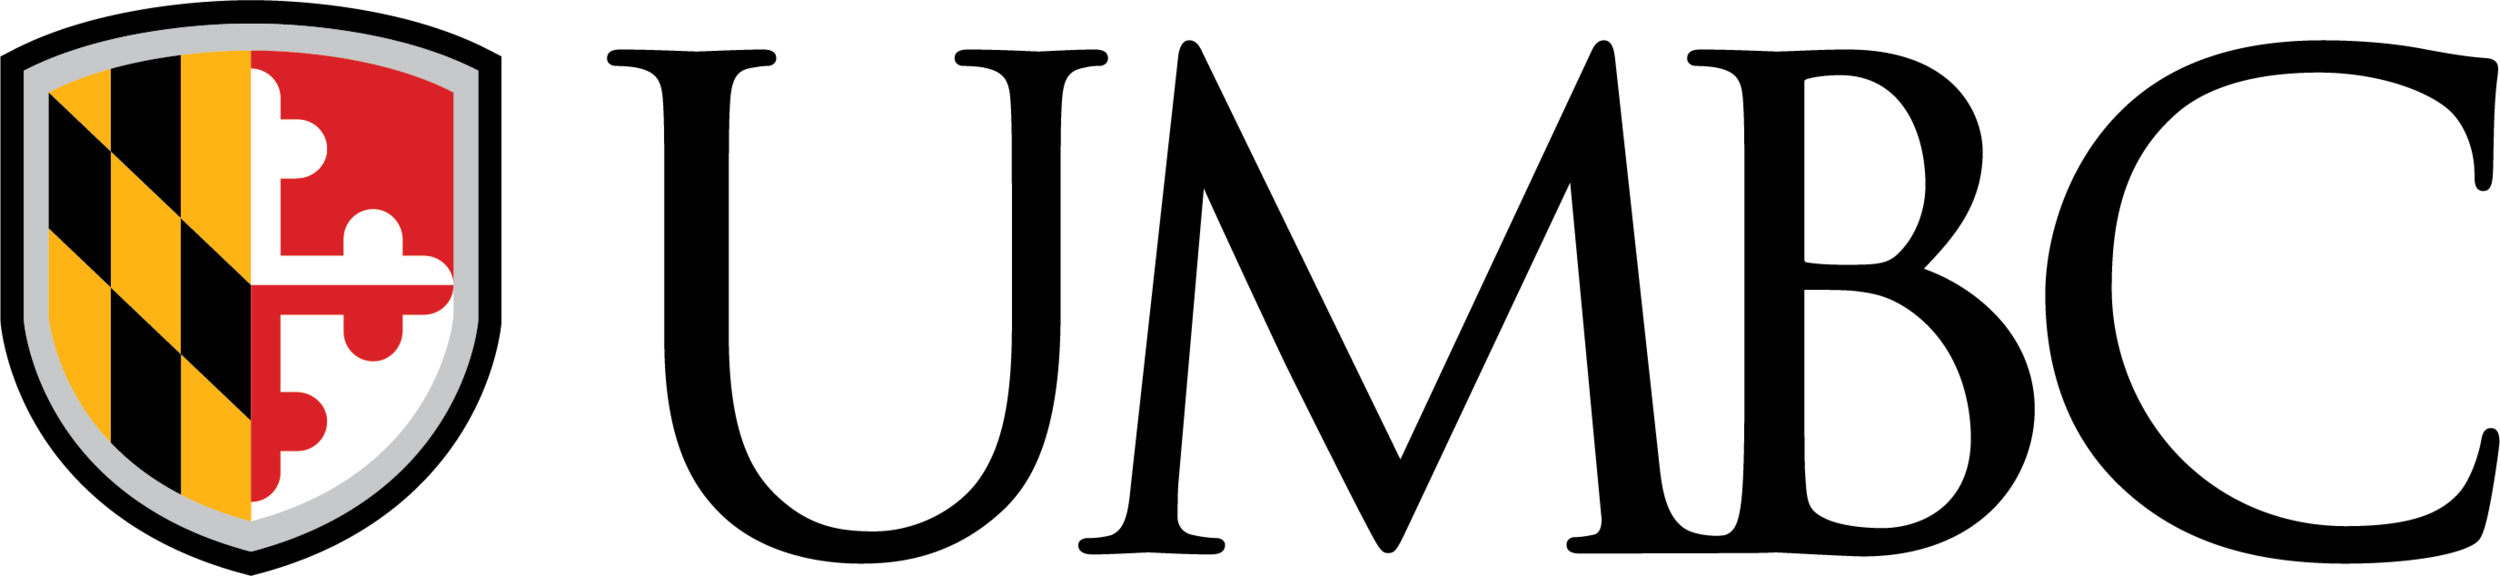 UMBC-primary-logo-RGB.png